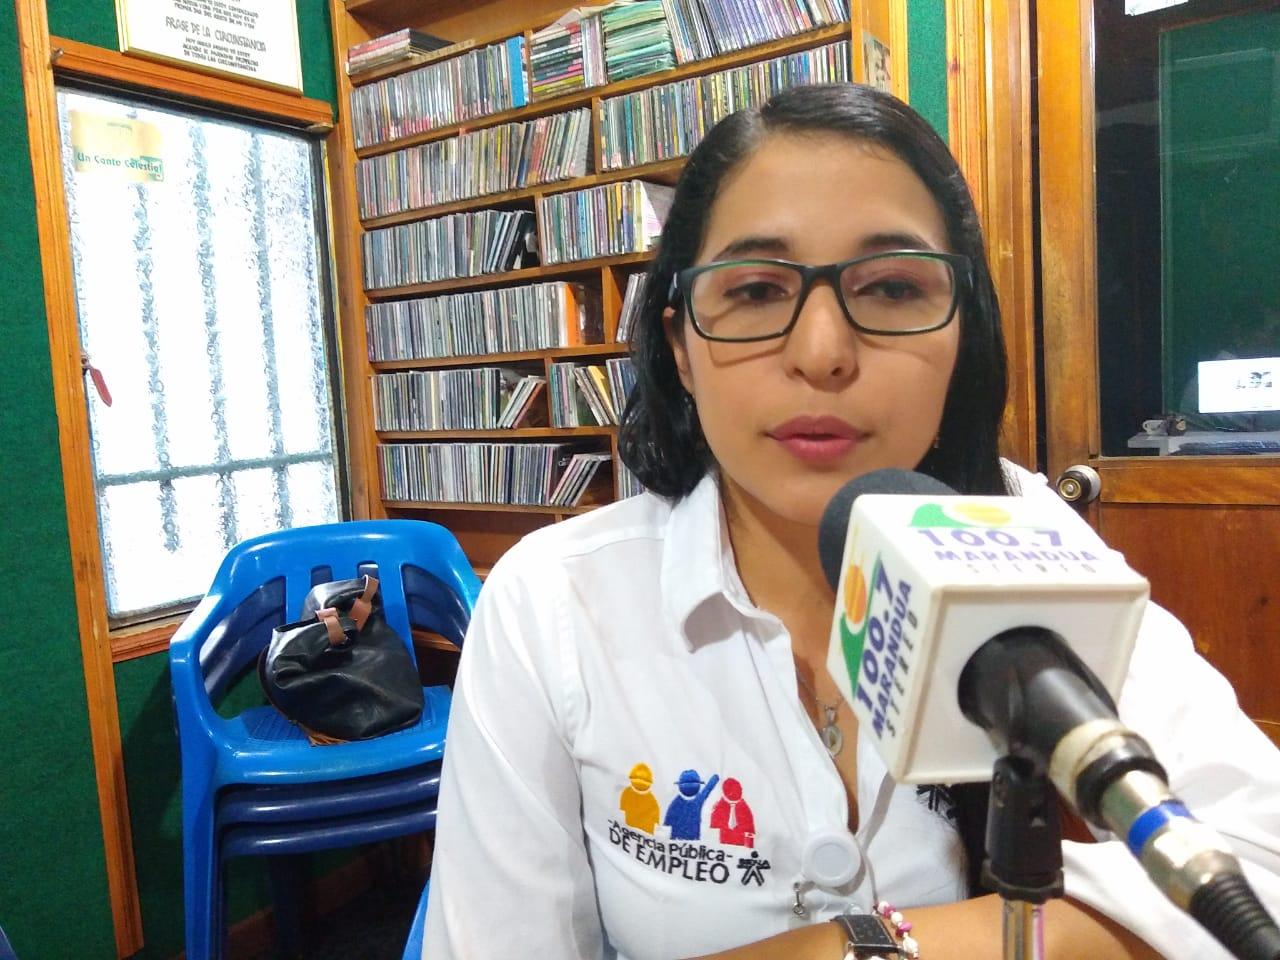 Angélica Soler de la Agencia Pública de Empleo SENA Regional Guaviare